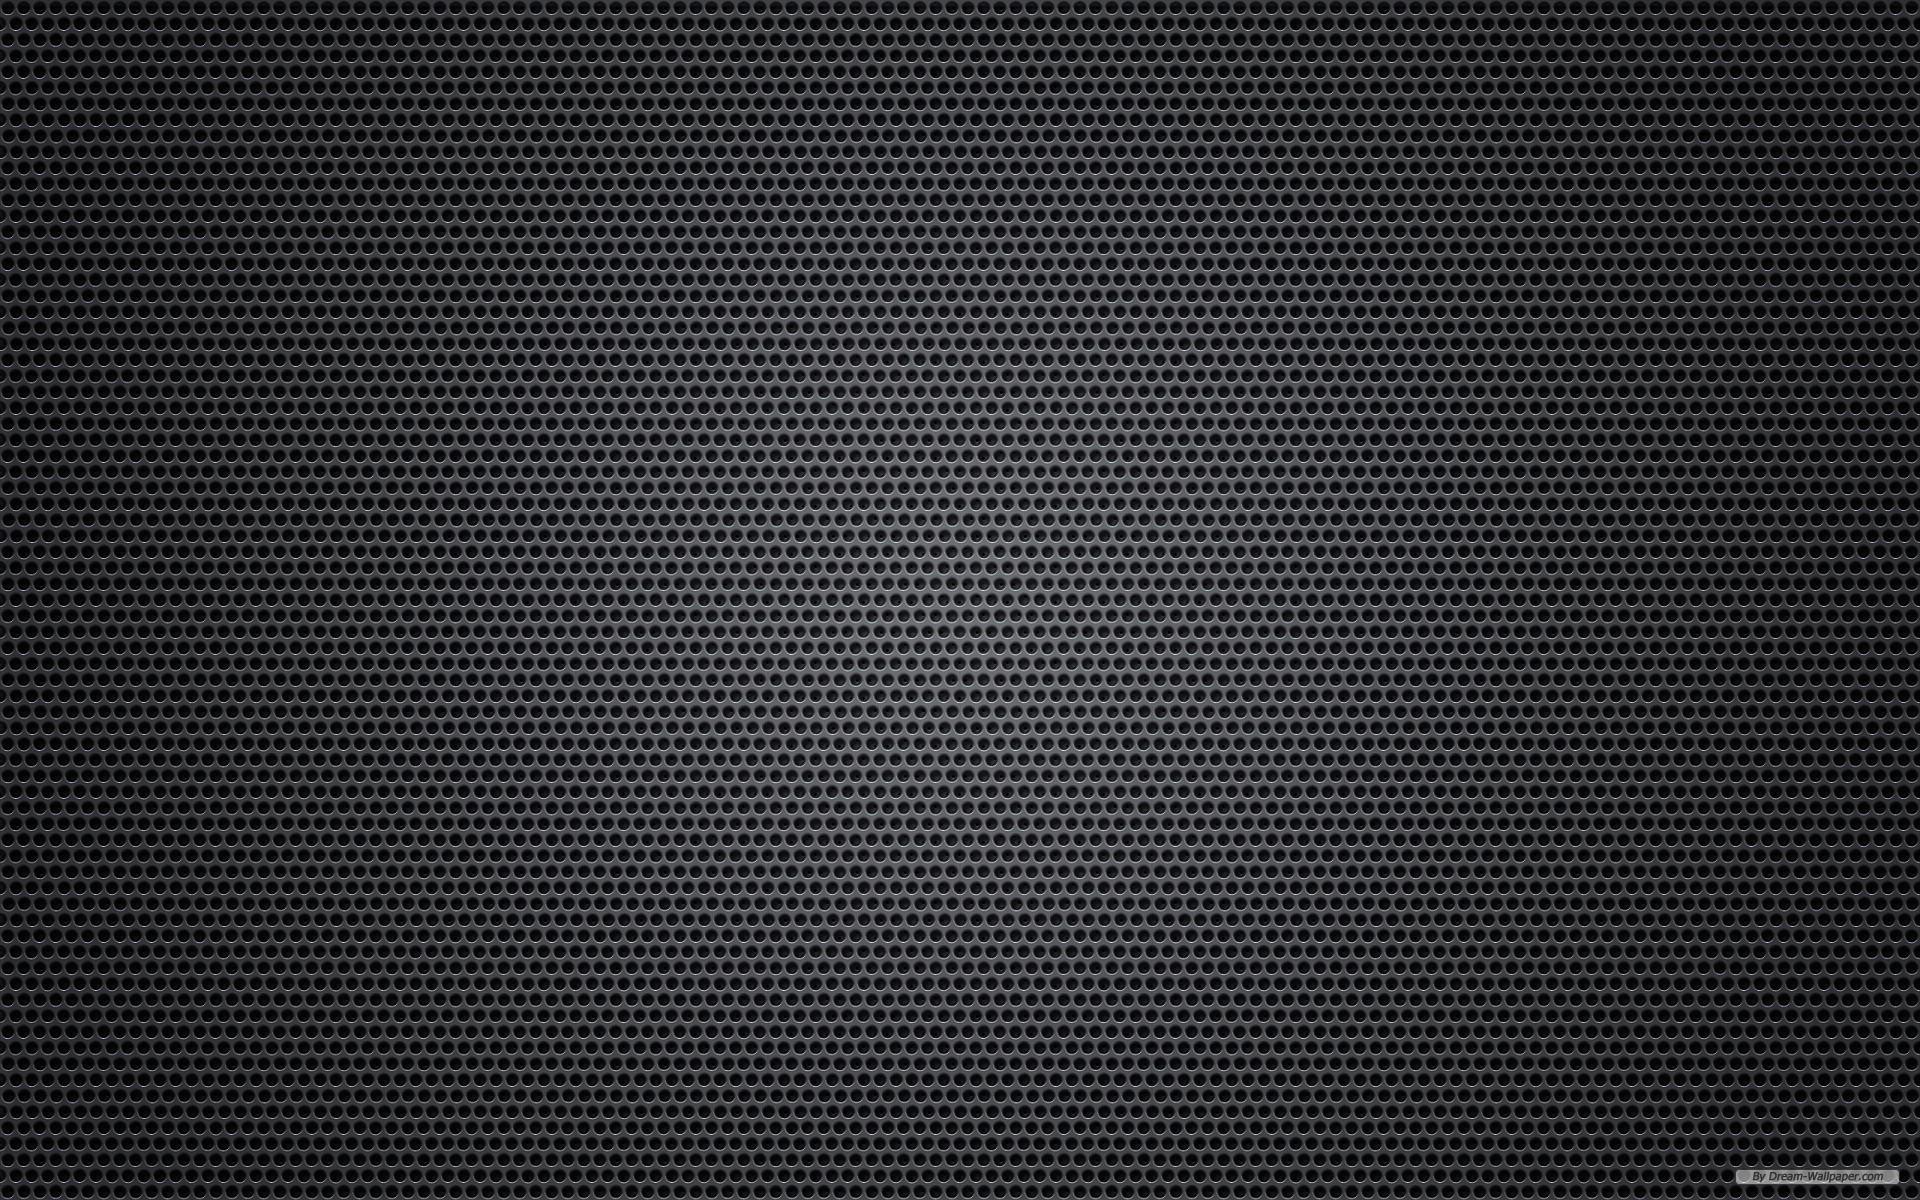 Carbon Fiber Pattern Photoshop wallpaper 200755 1920x1200